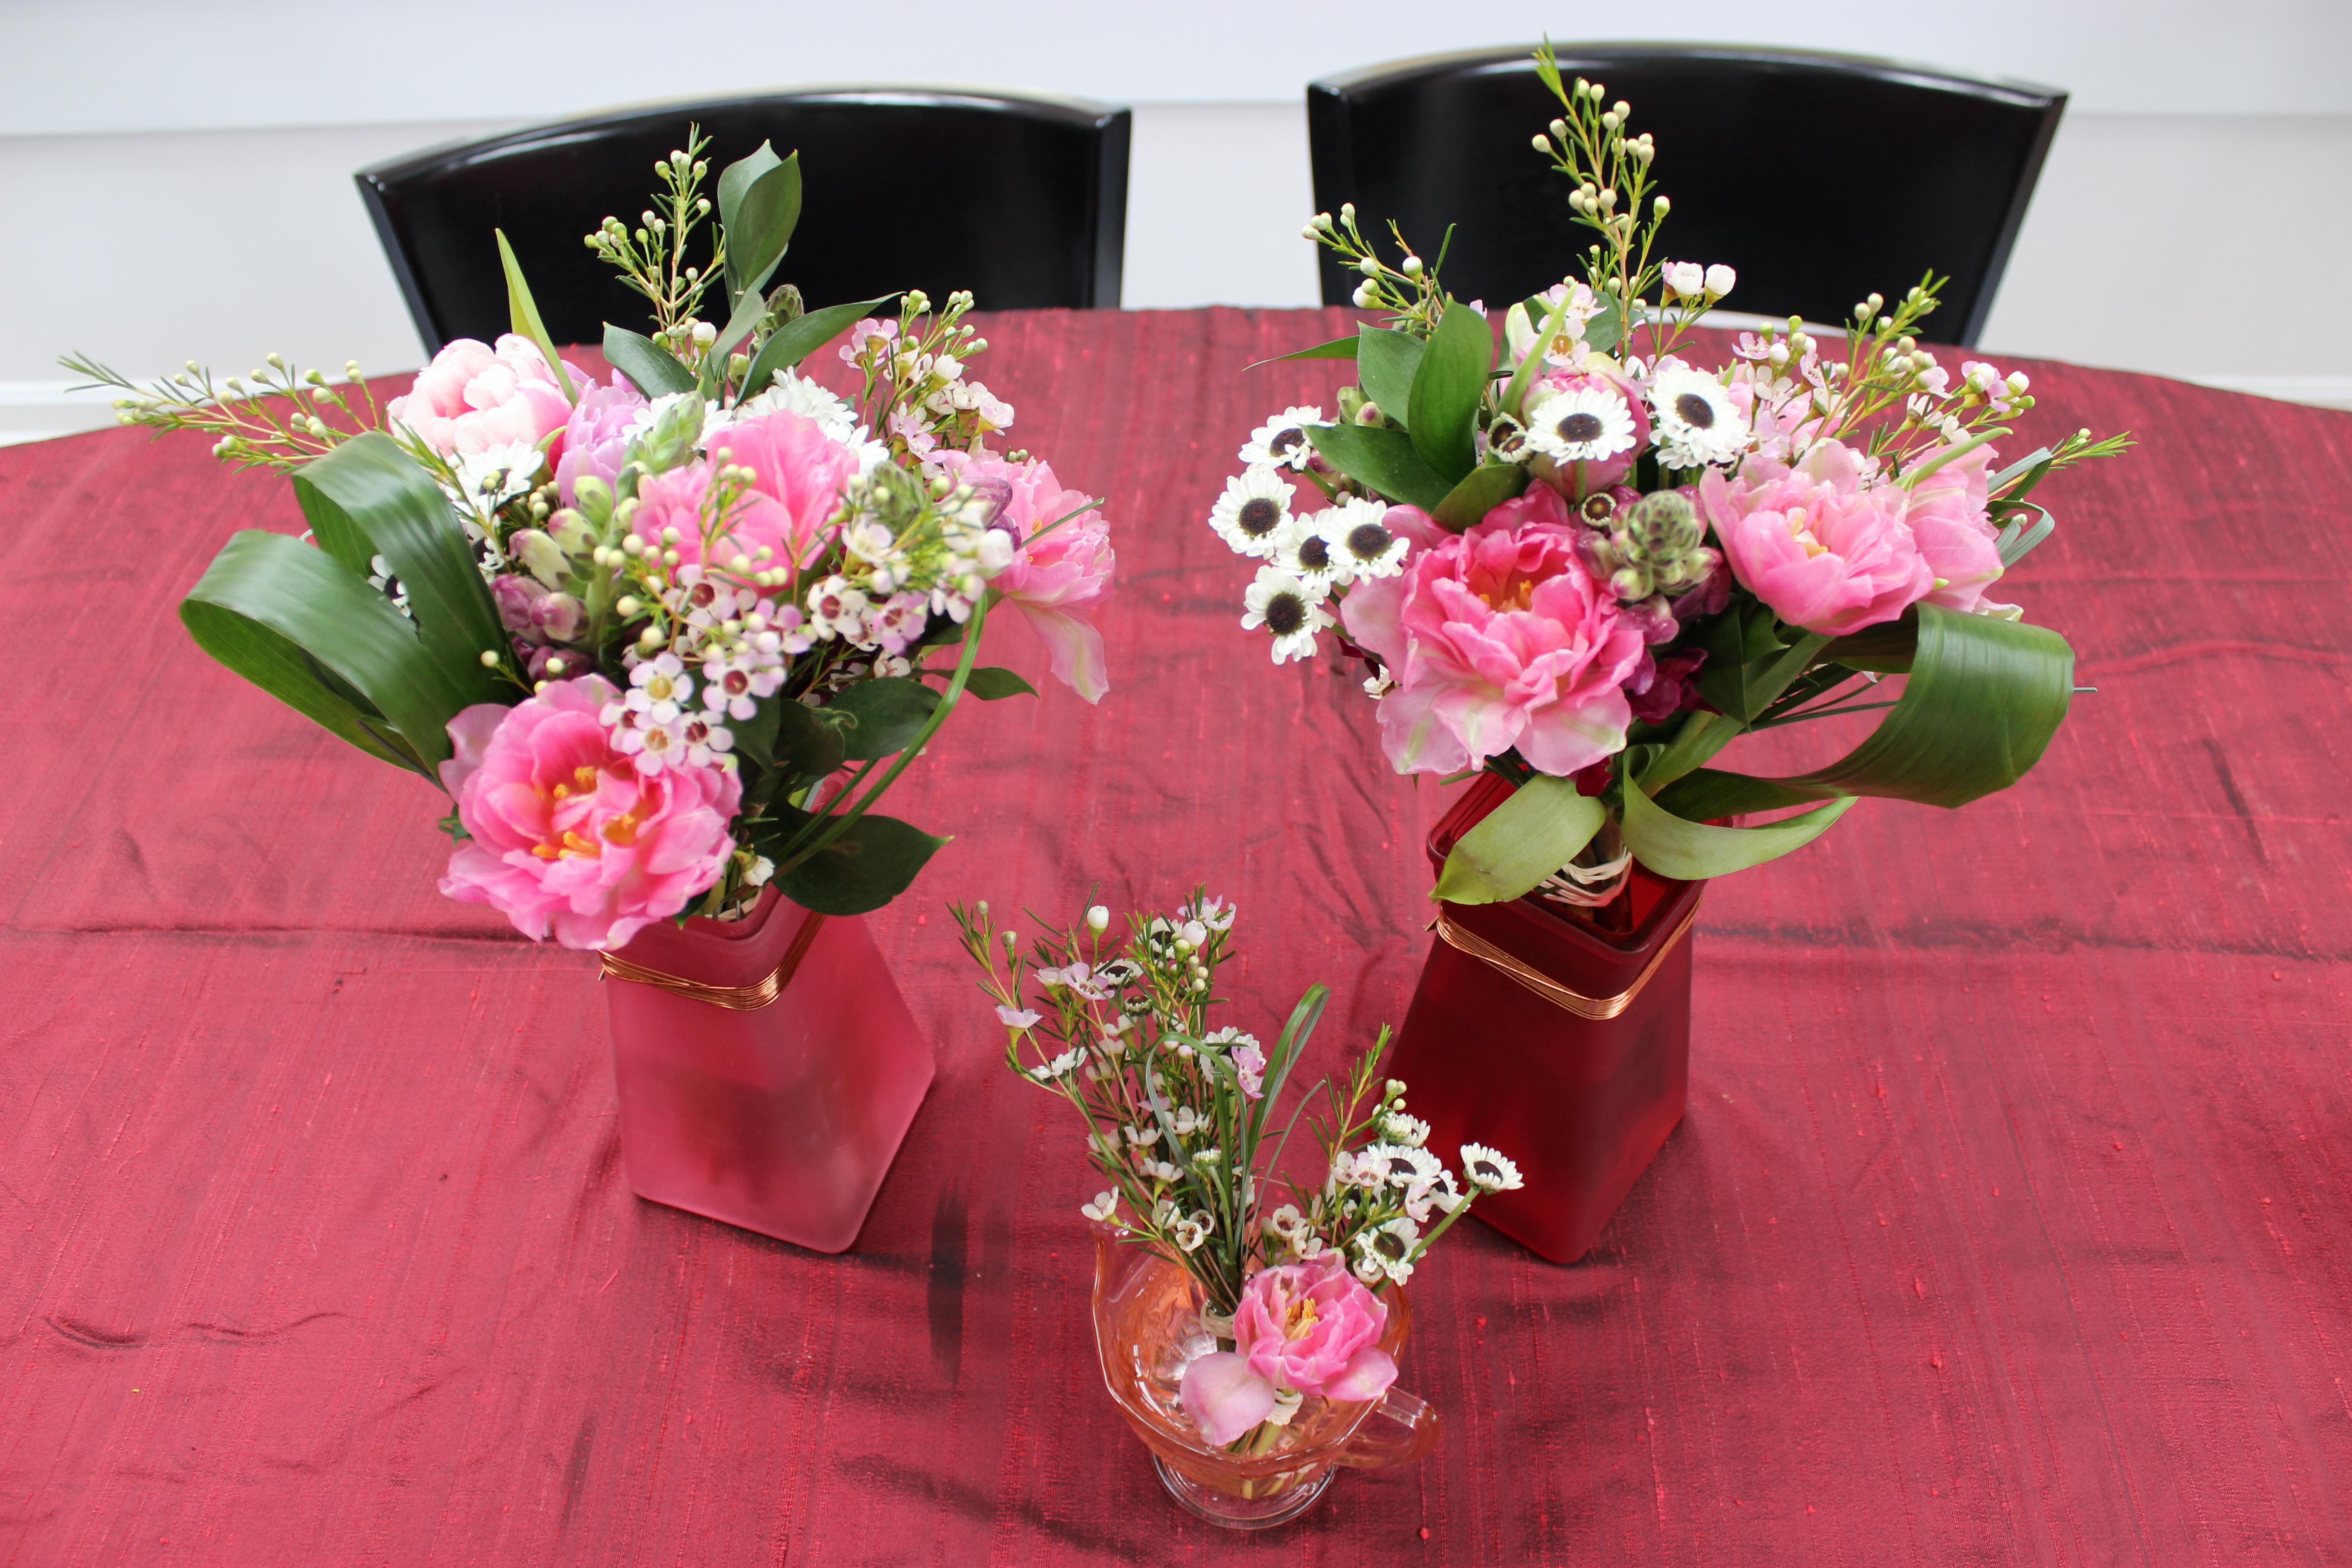 Smithsonian associates valentines day bouquet workshop 1100 img1135 izmirmasajfo Choice Image